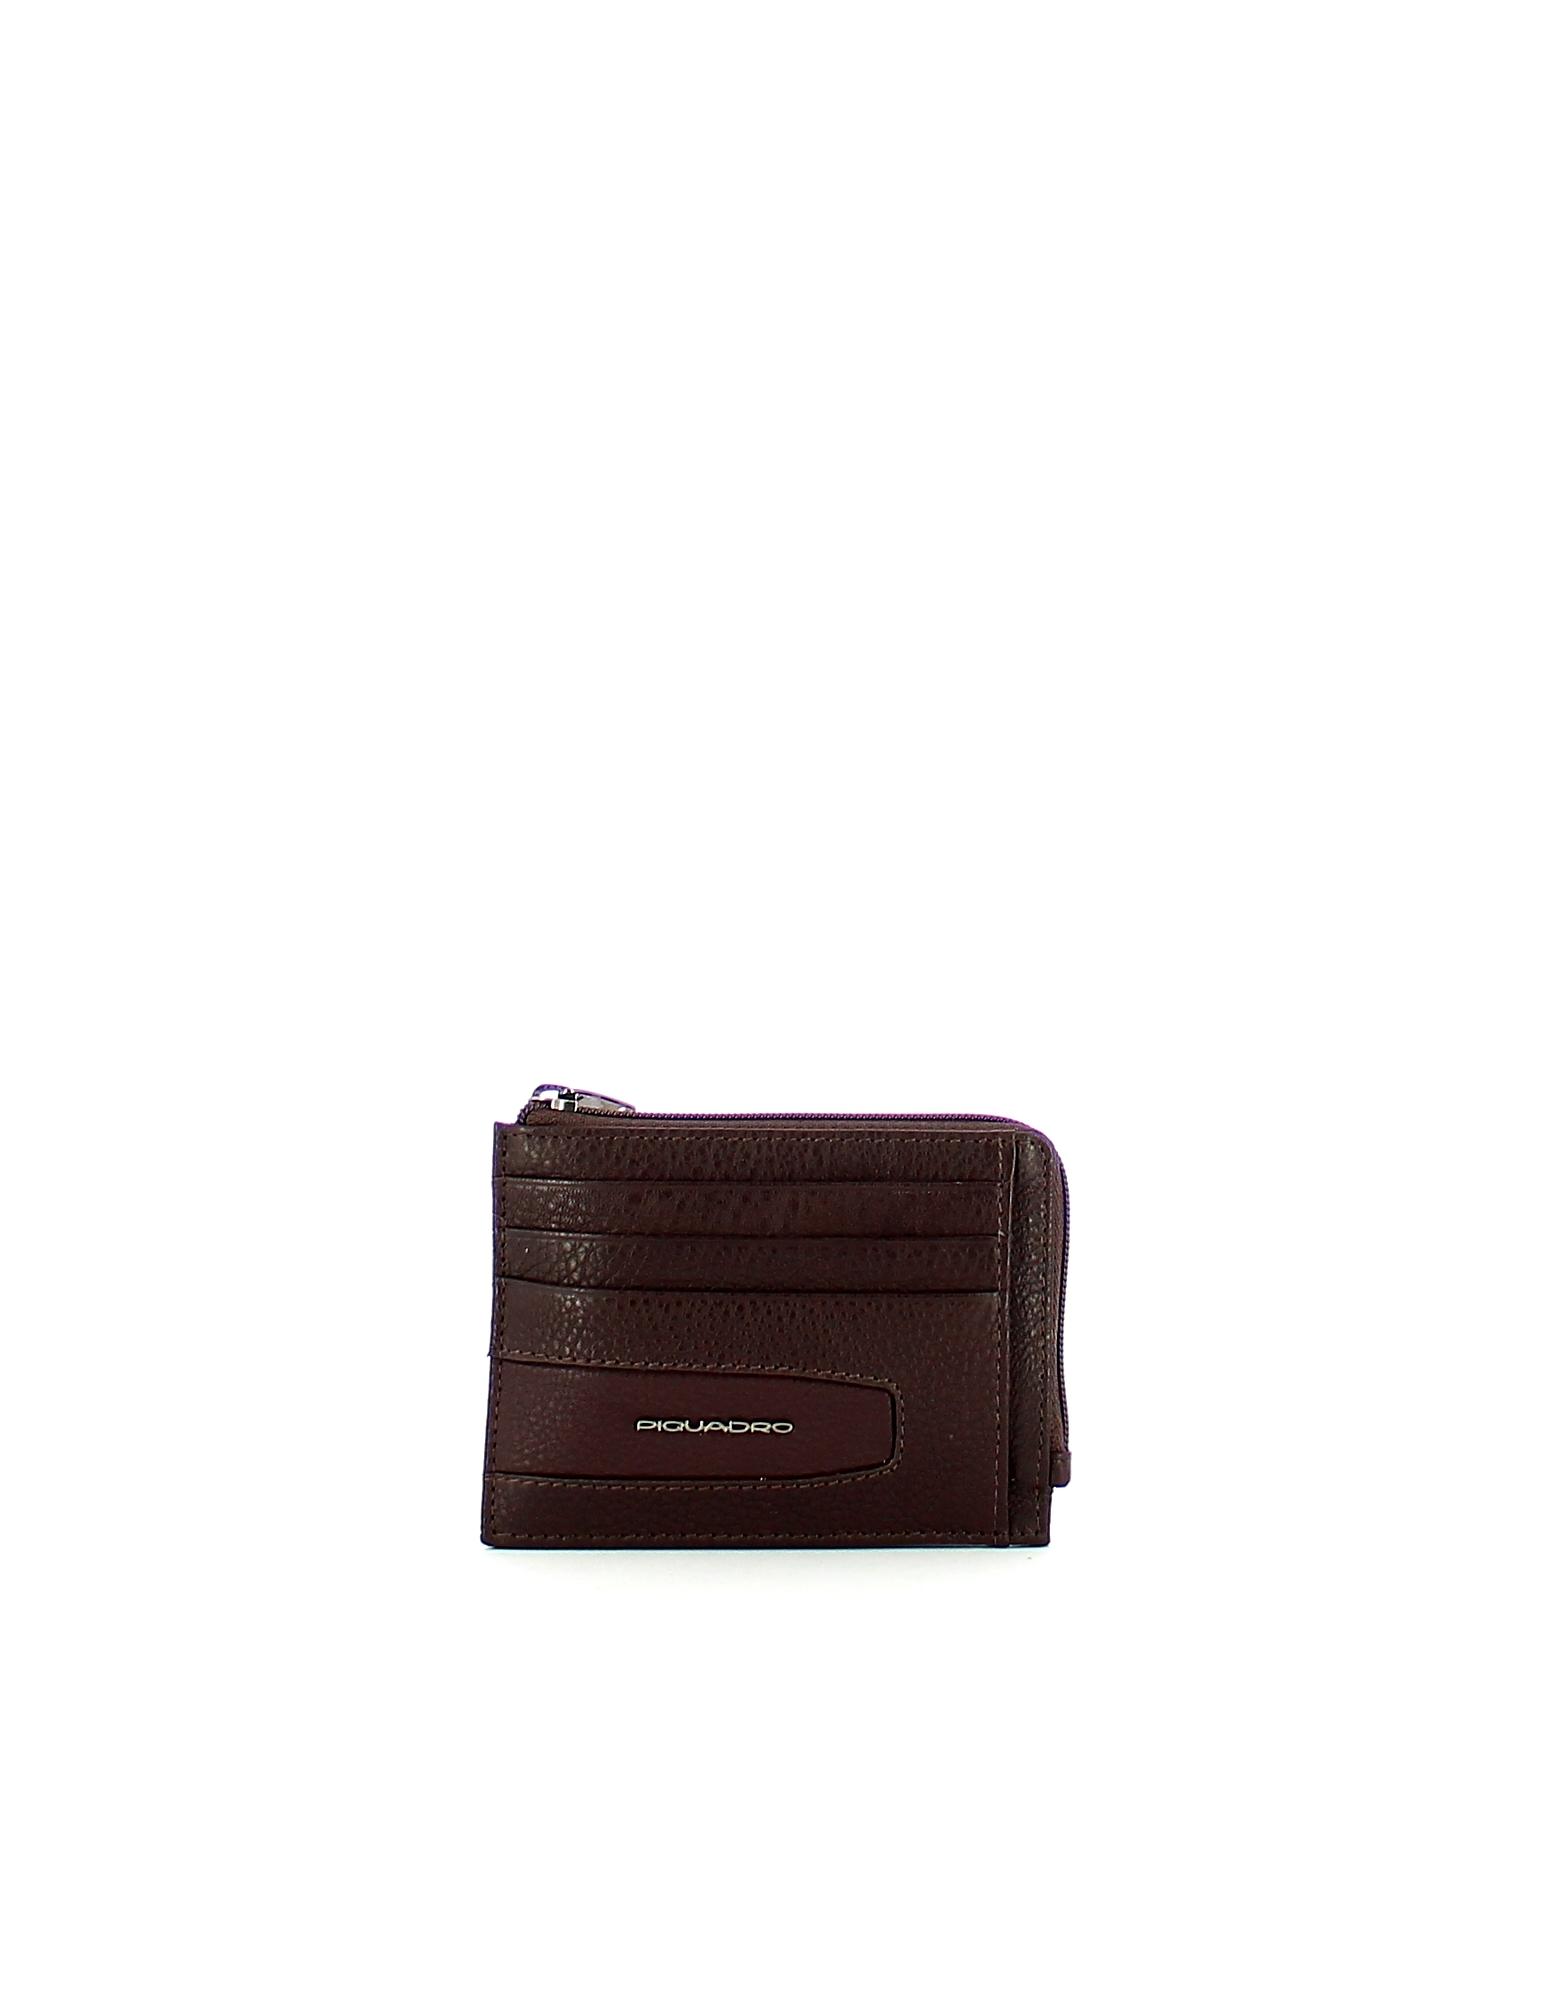 Piquadro Designer Men's Bags, Men's Brown Wallet